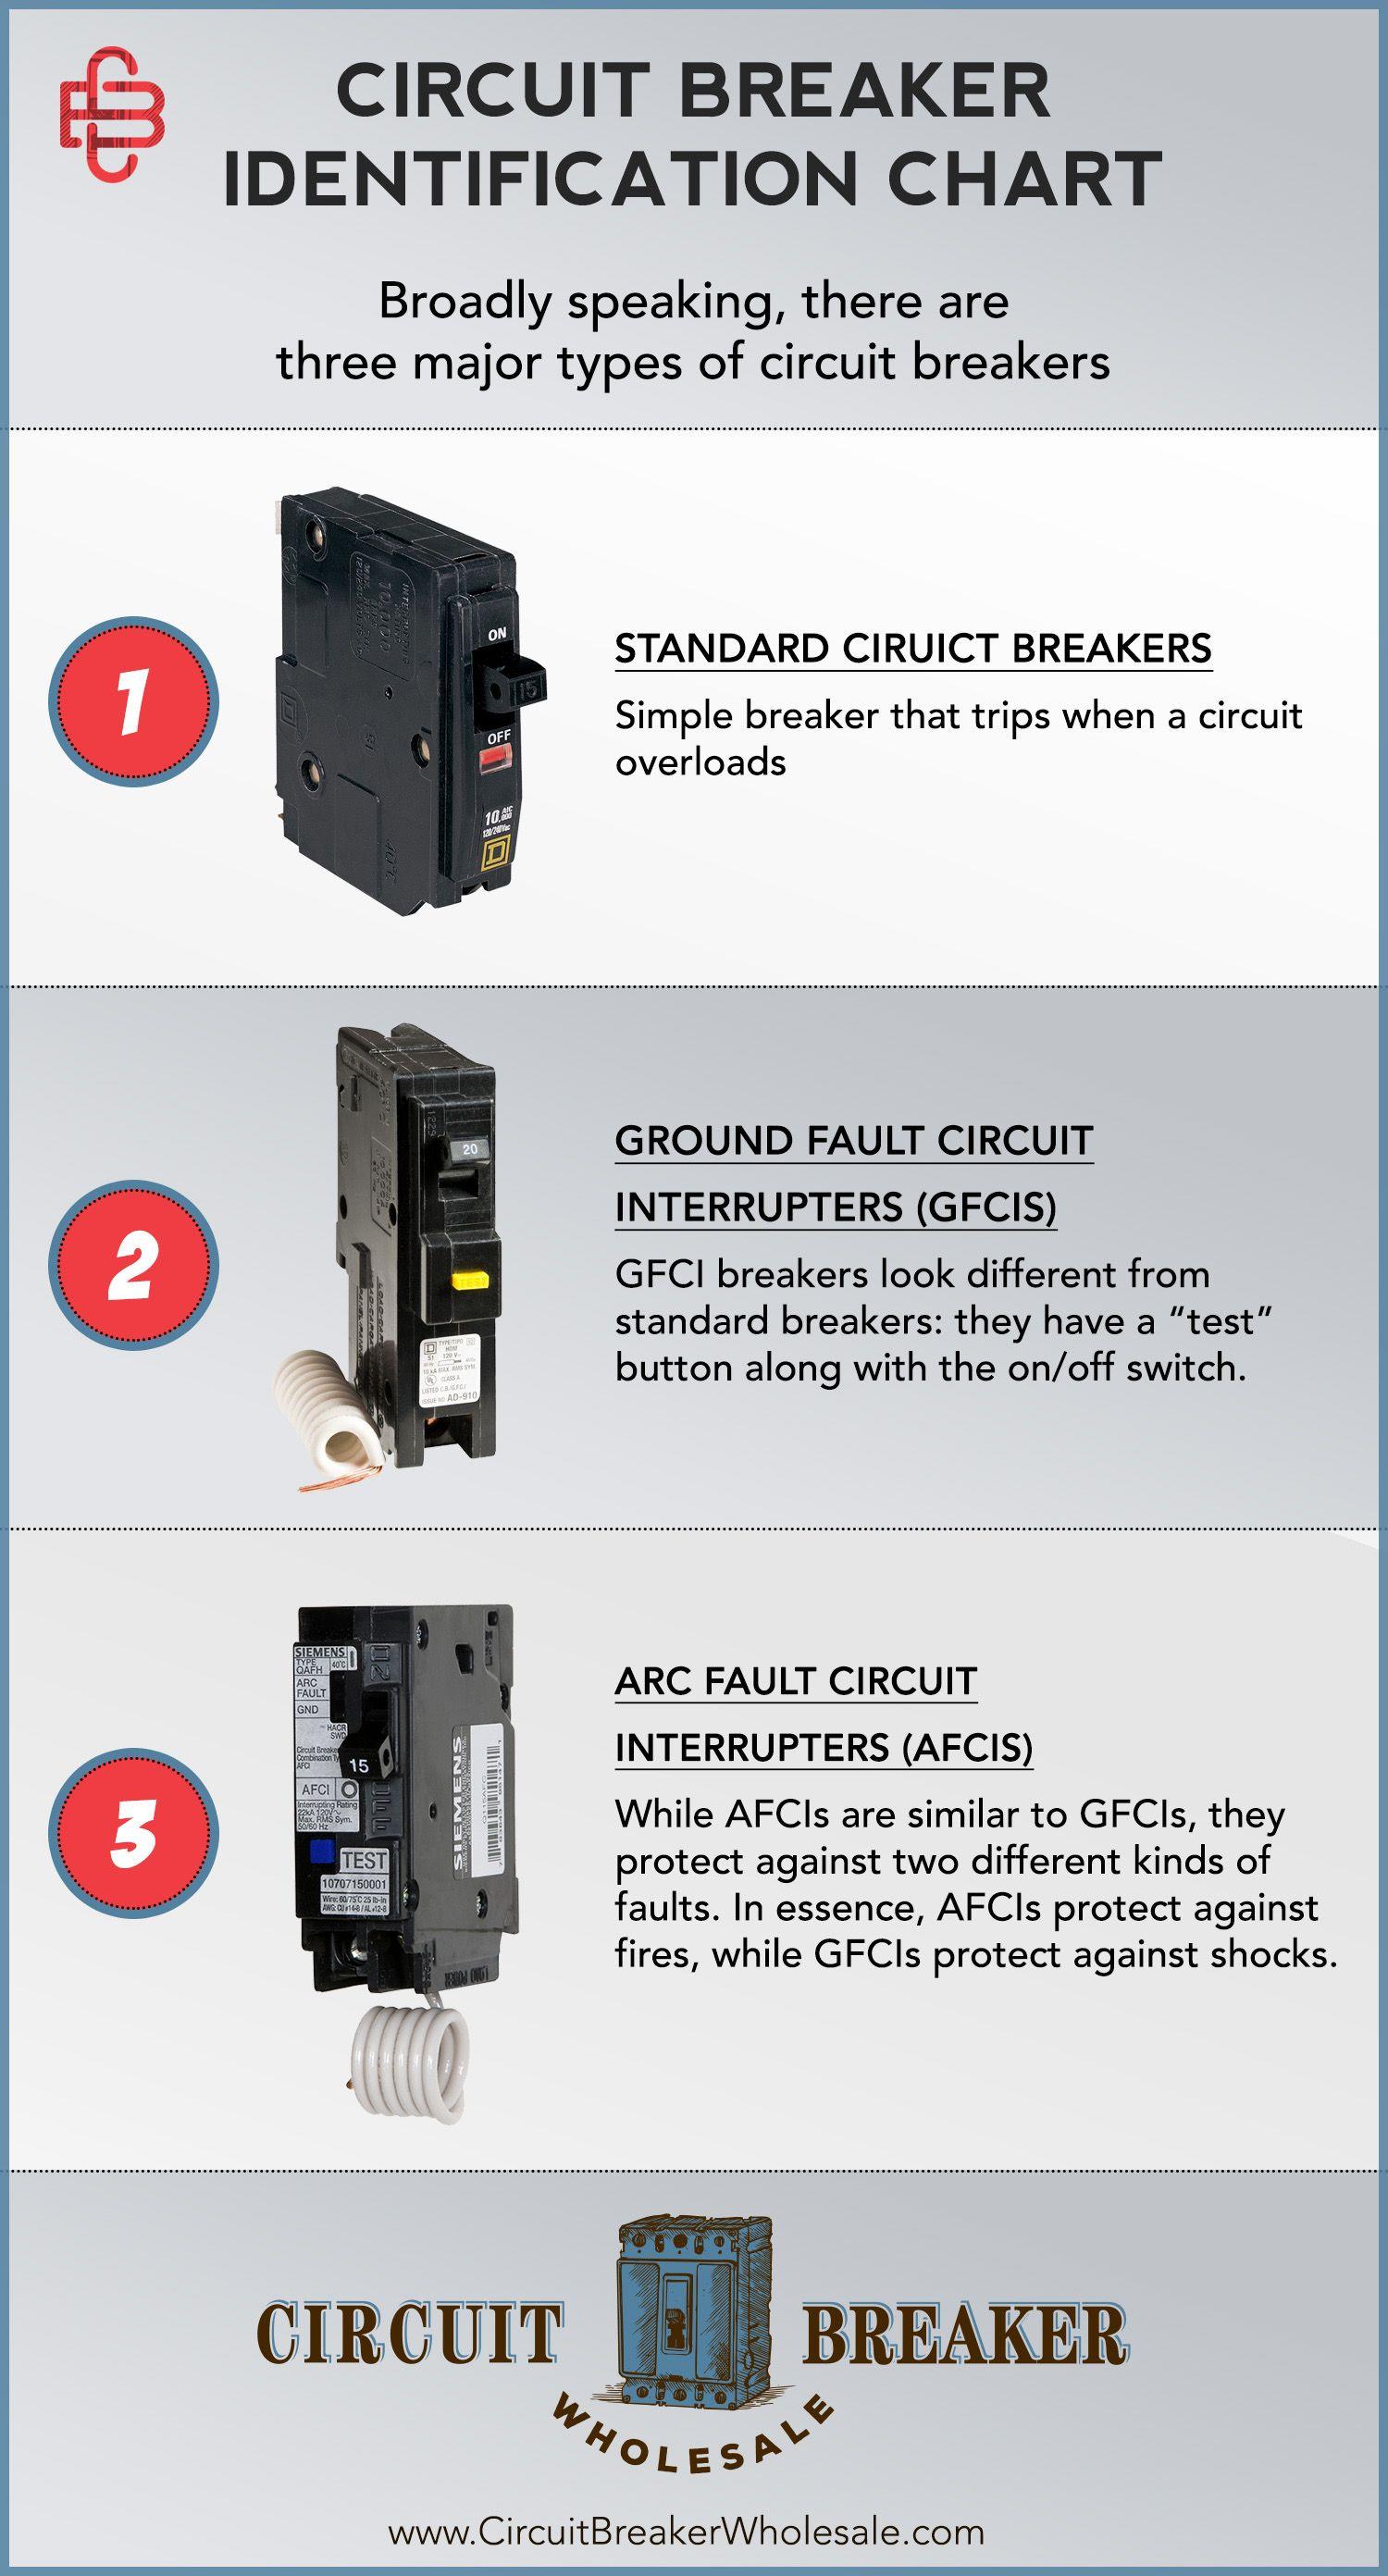 How To Identify Circuit Breaker Types